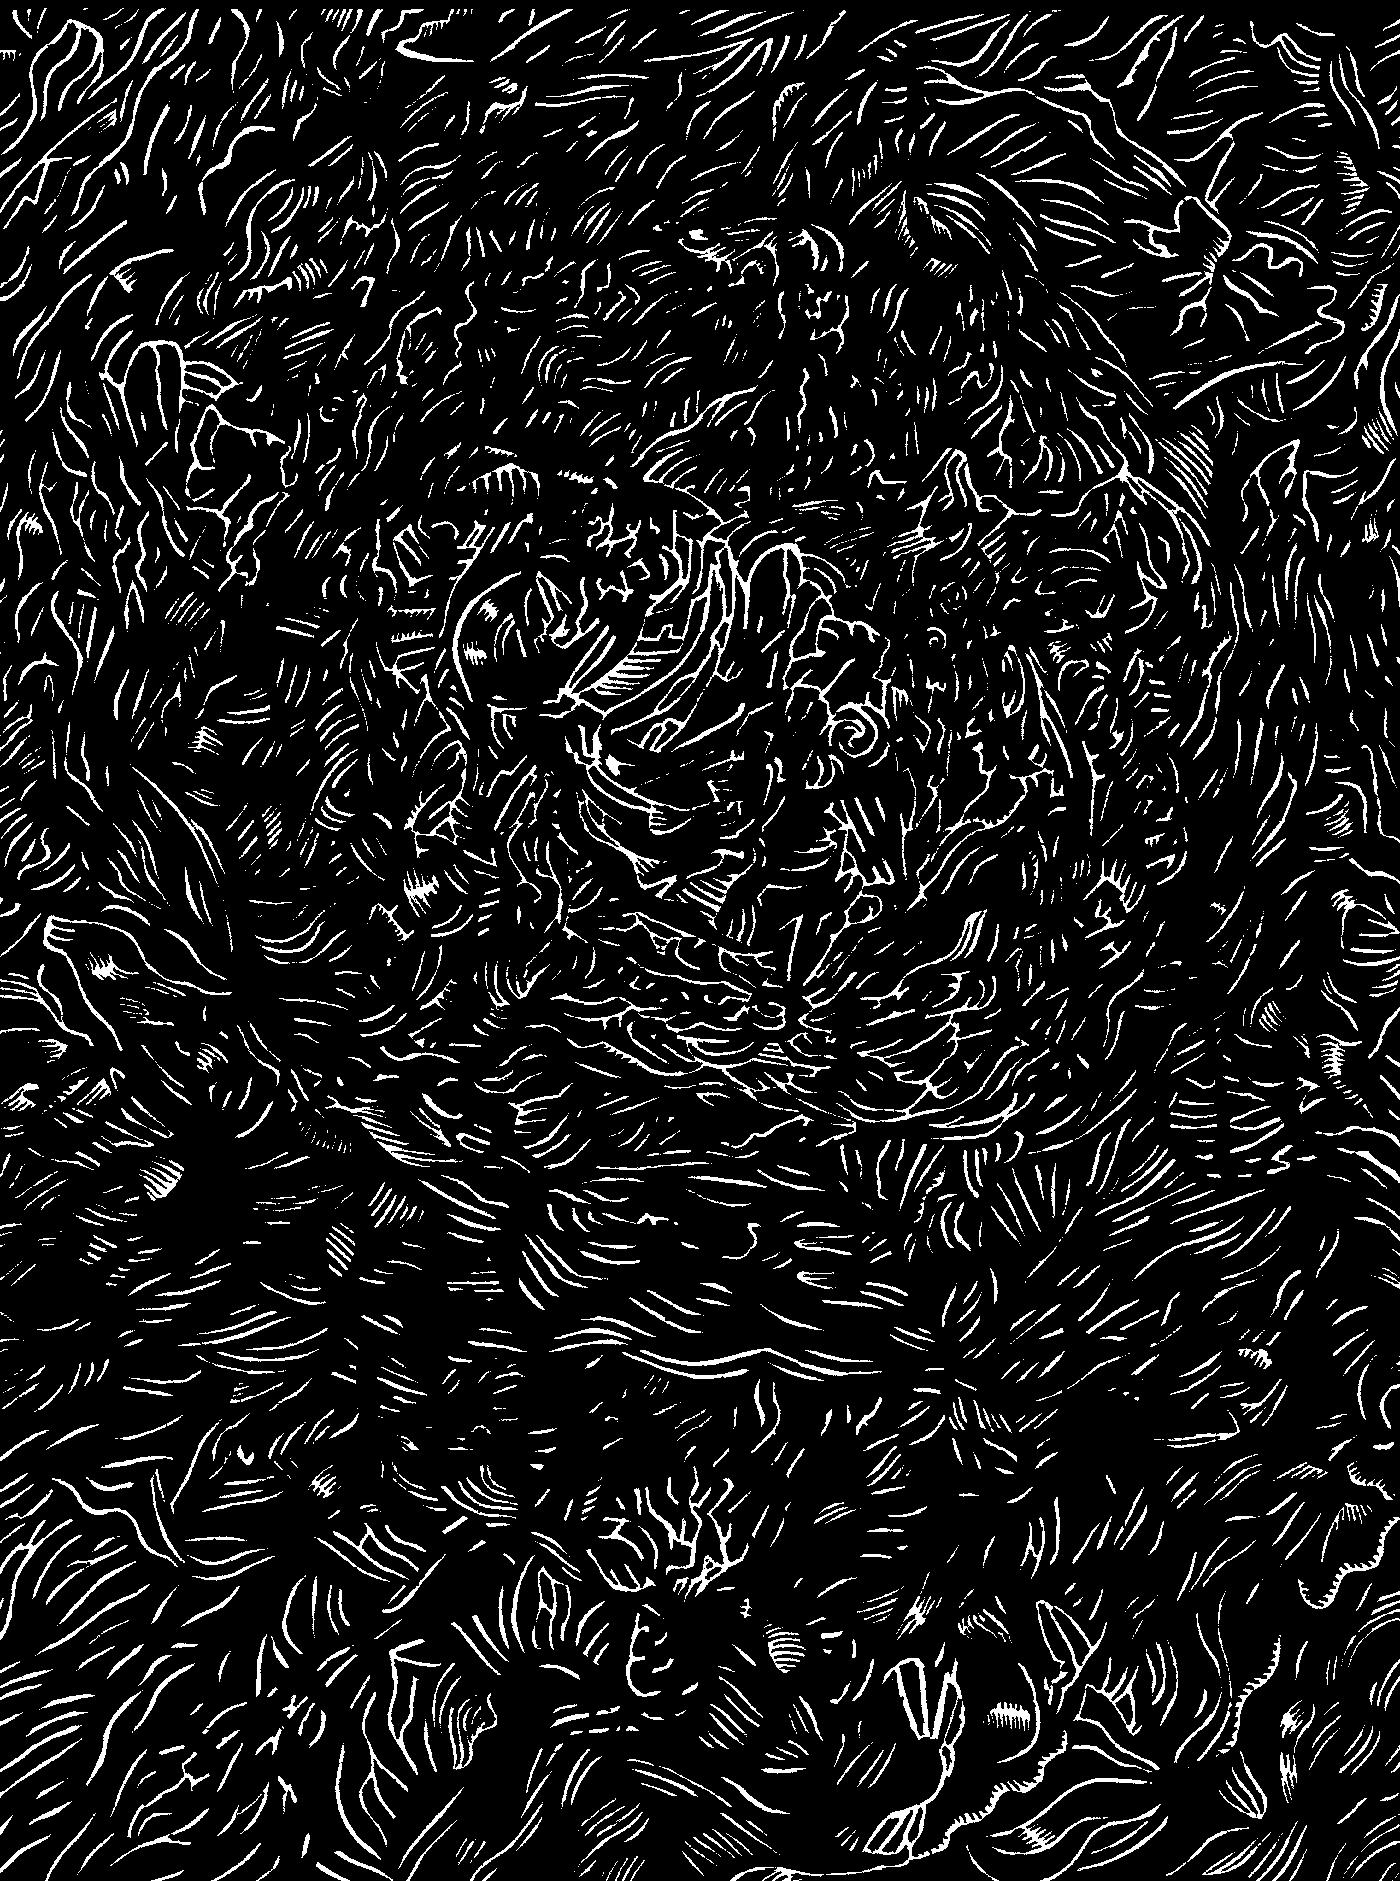 InkSketch3.png